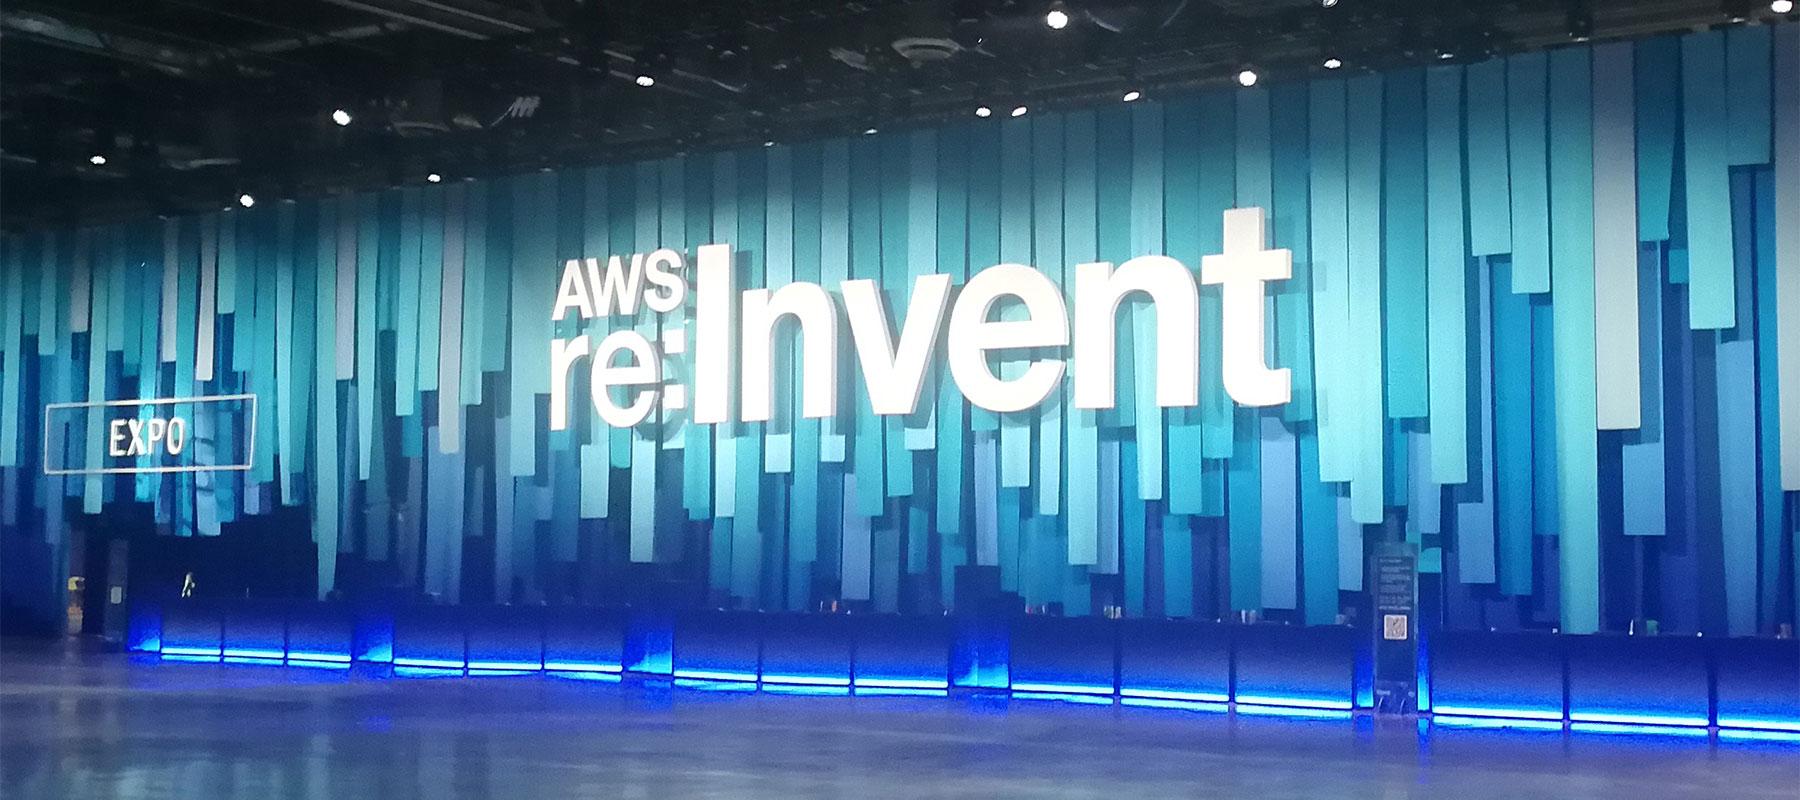 AWS reinvent 2017